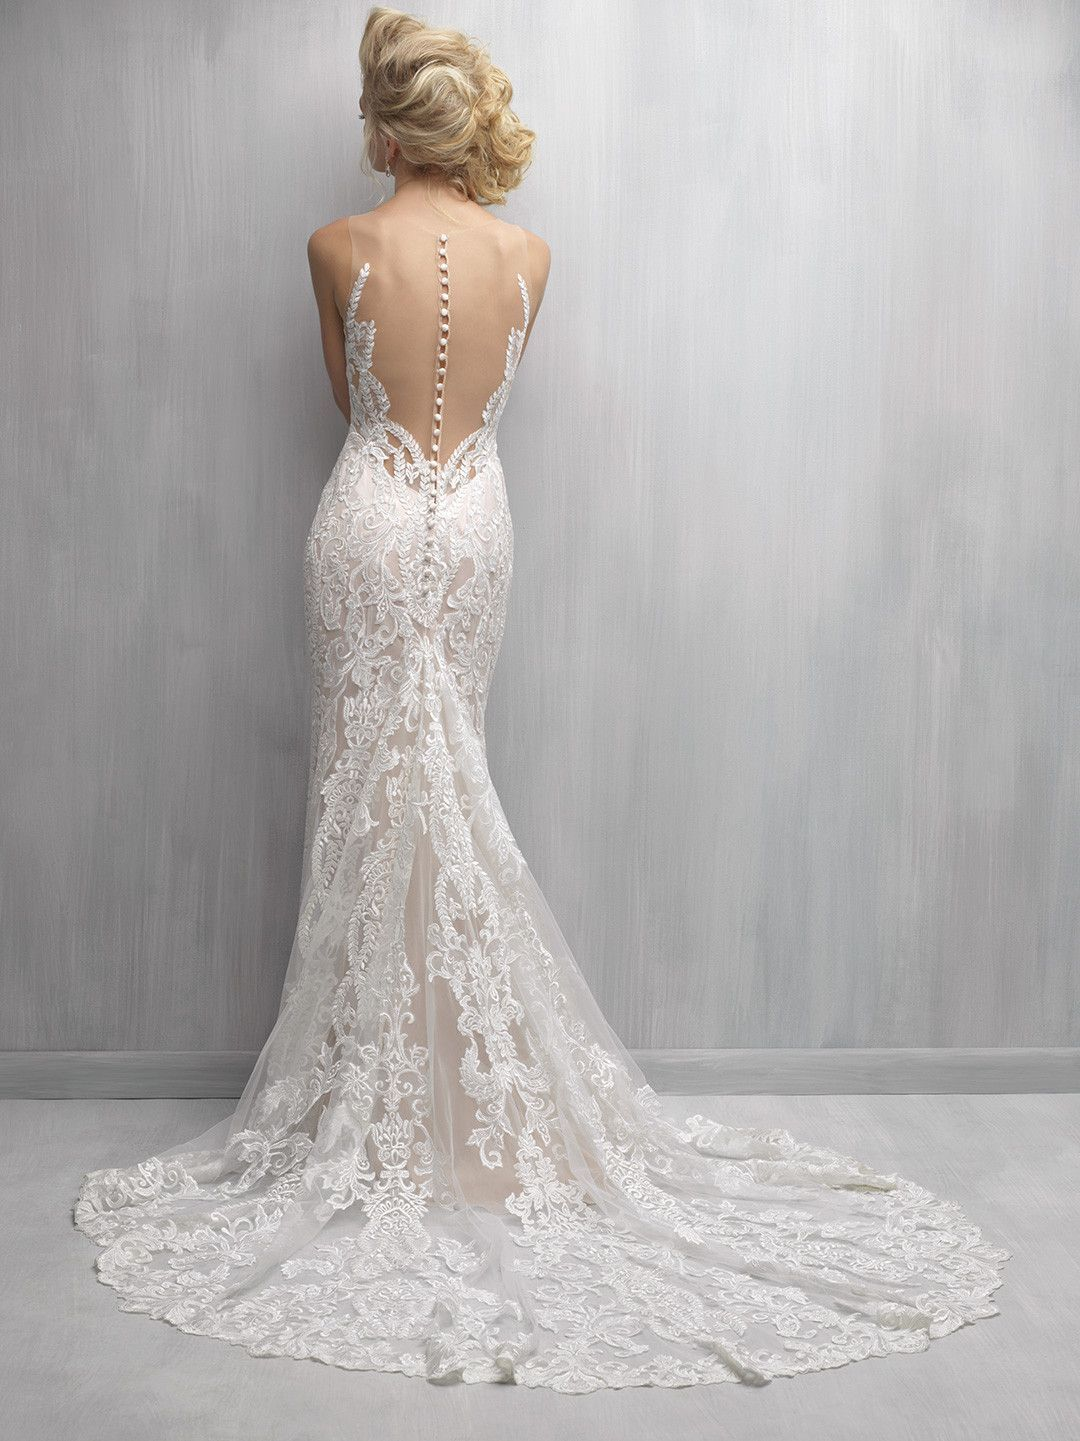 Wedding dresses fresno  Madison James MJ  All Things Wedding  Beautiful Ideas